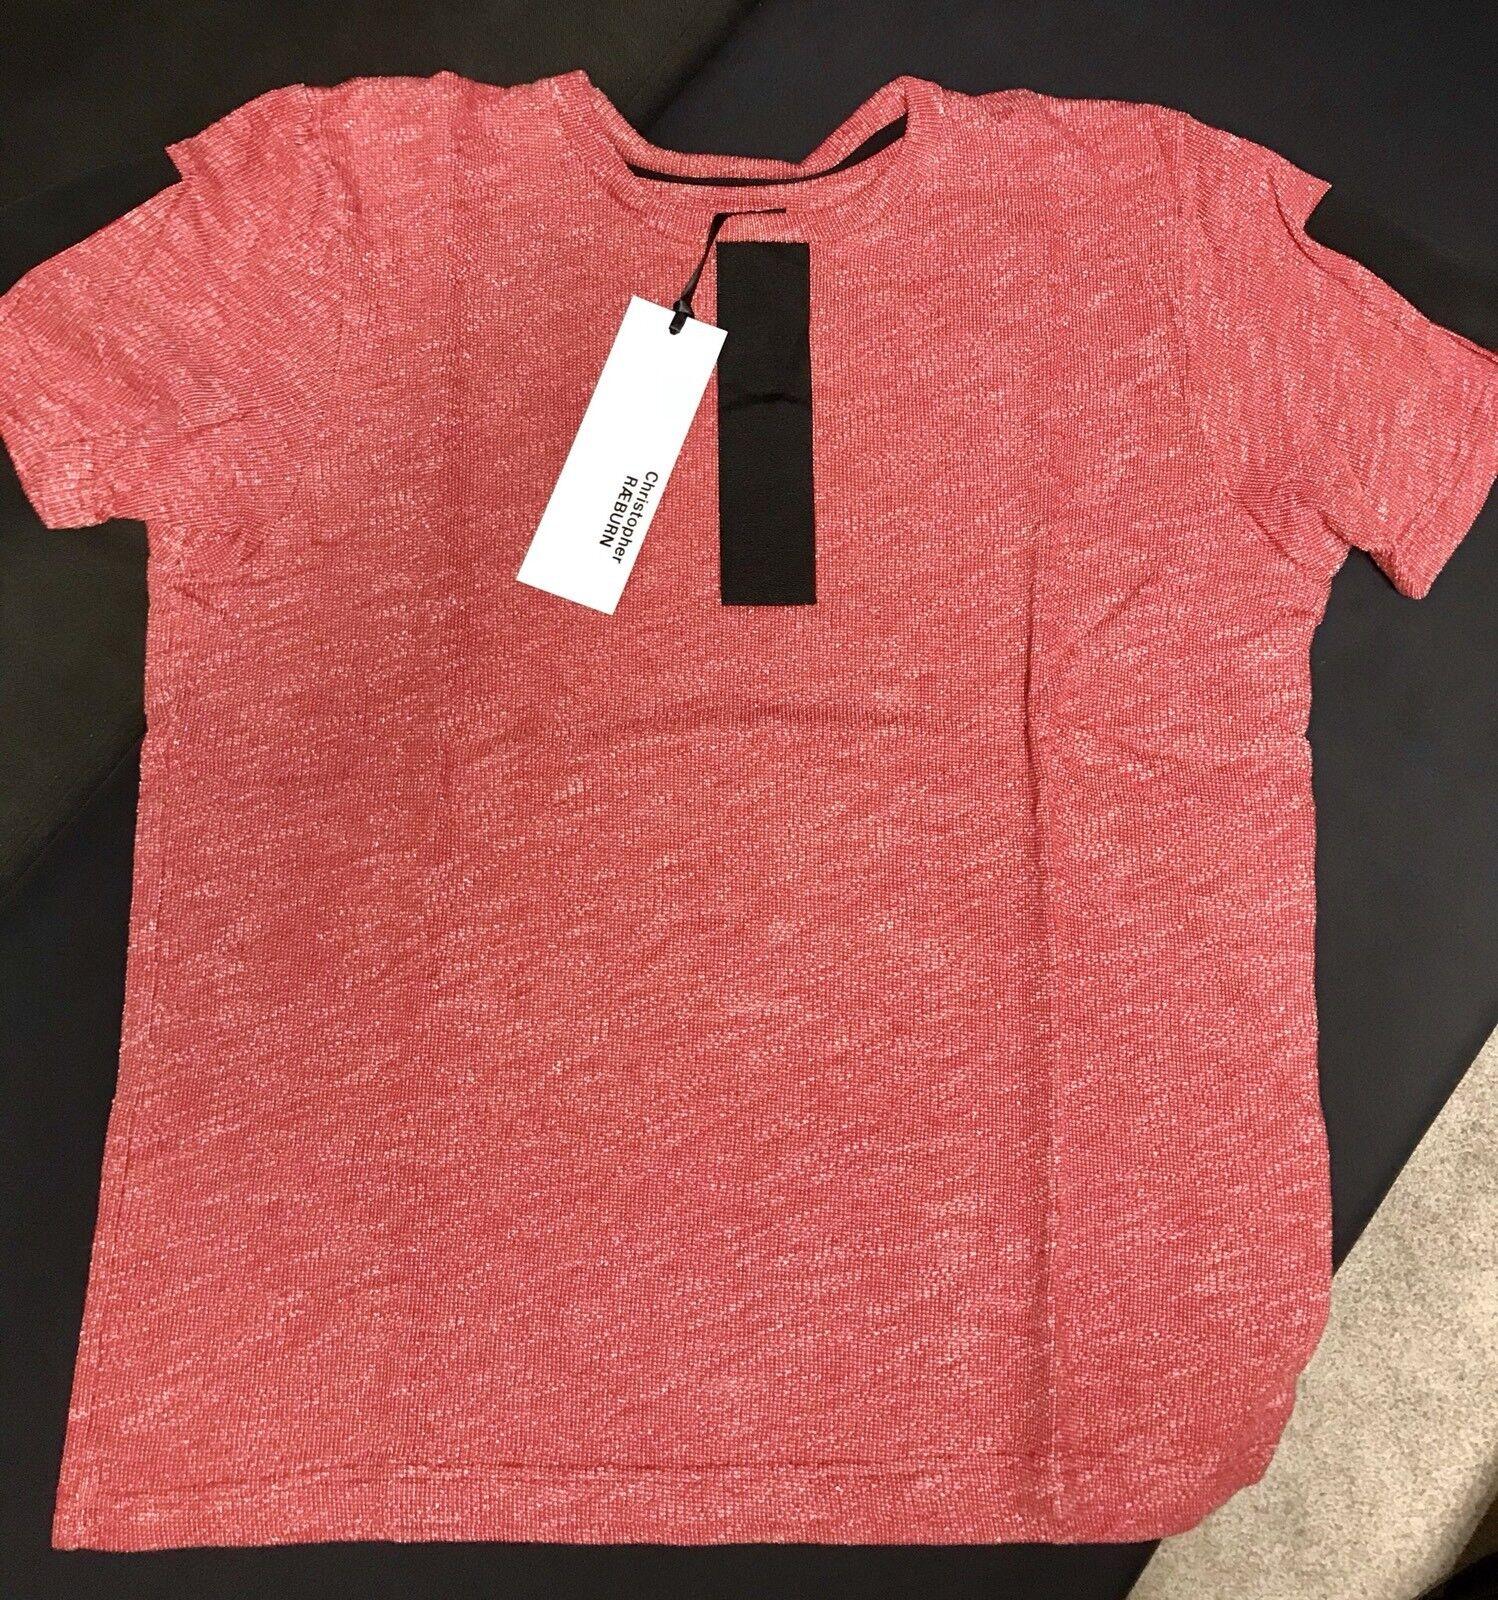 Christopher Raeburn Jersey  Herren Grosgrain OverGrößed T-shirt (ROT & Weiß,L Größe)